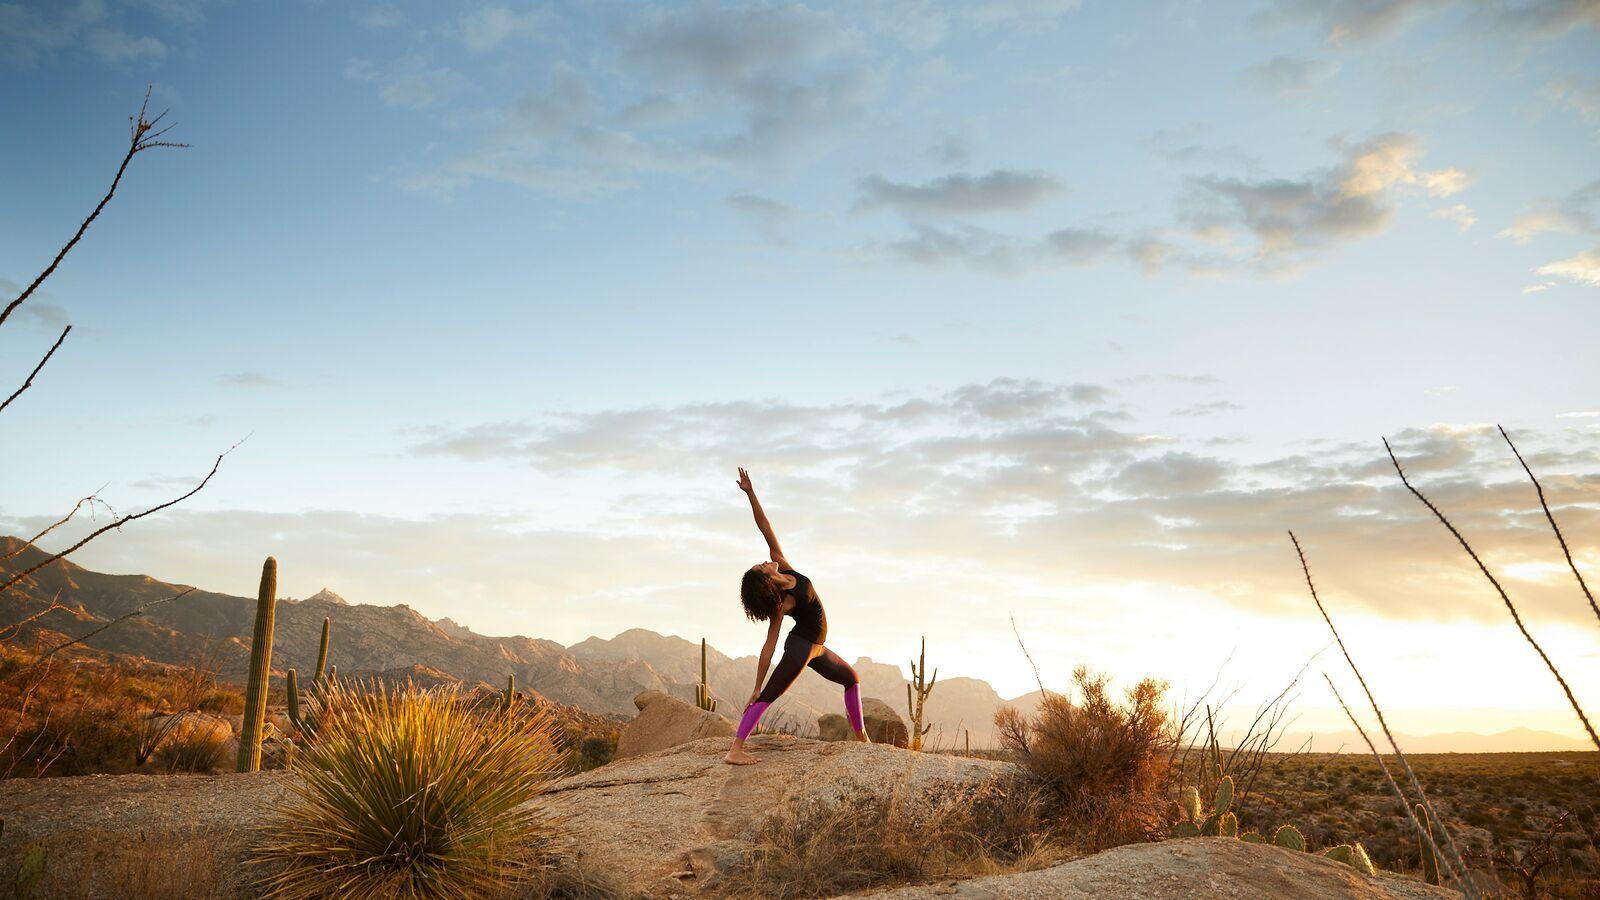 A woman doing a yoga pose, desert, cactus, mountains